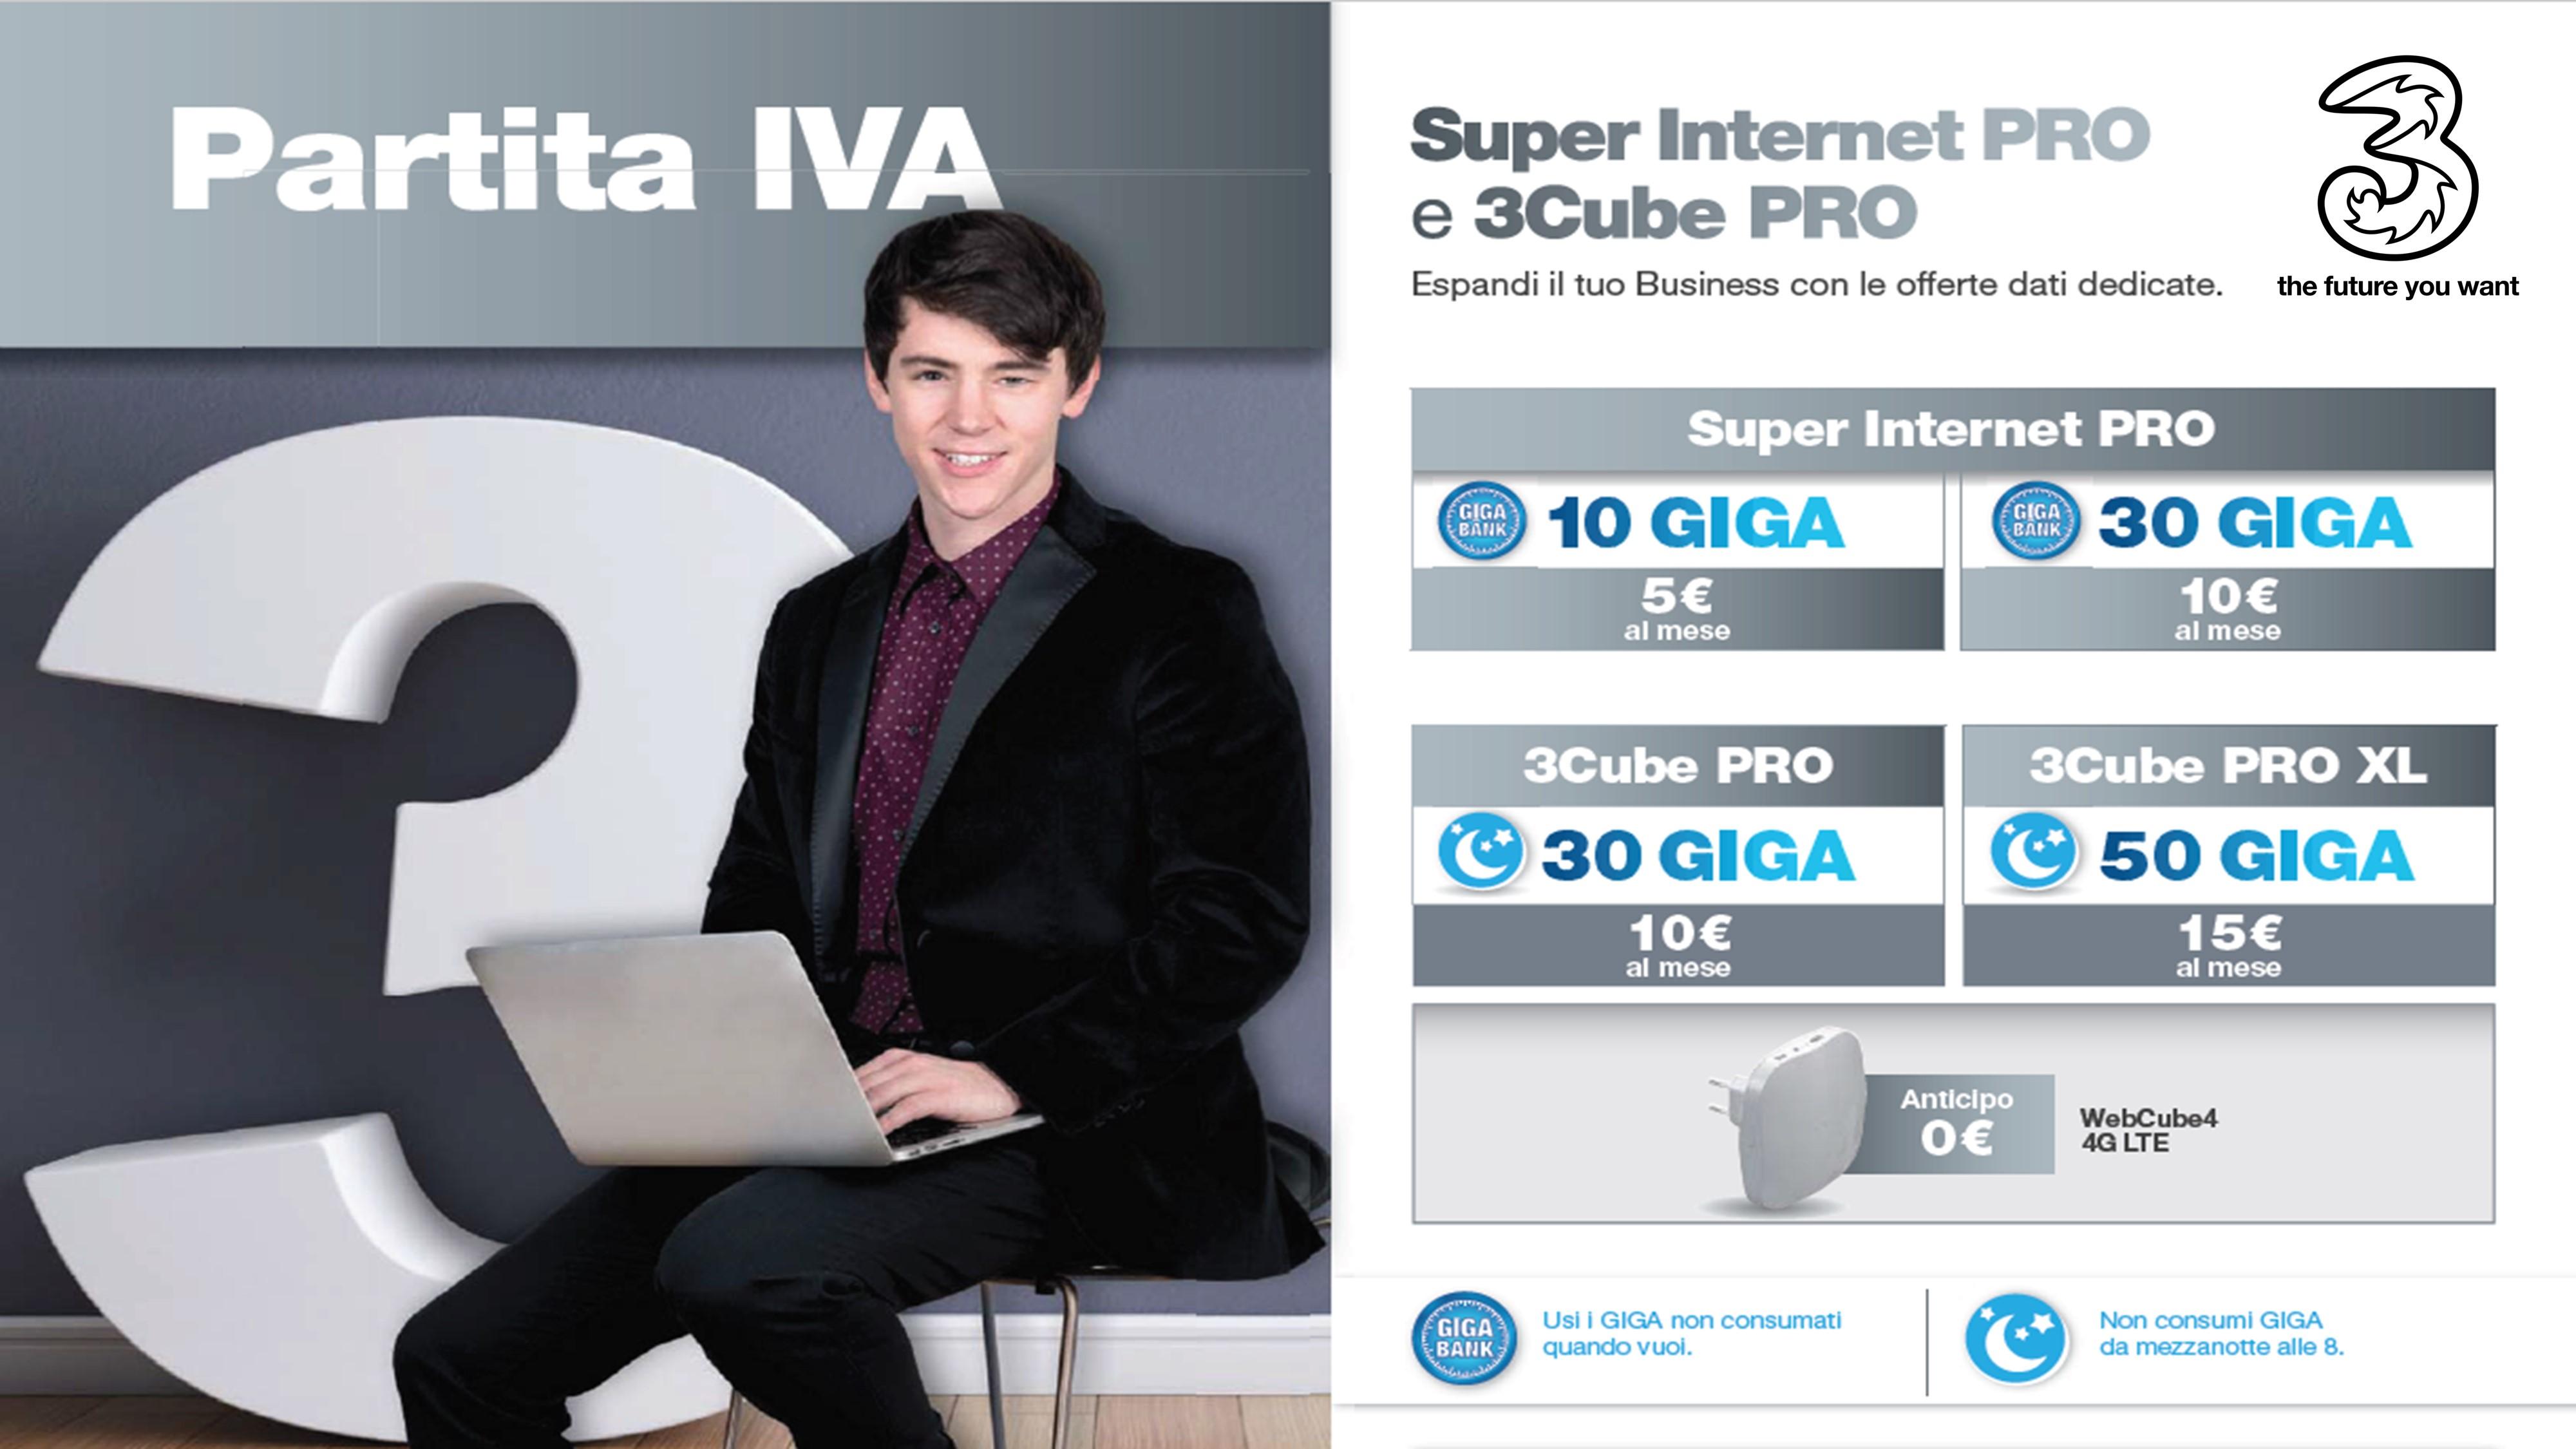 super internet PRO e 3cube PRO P.Iva